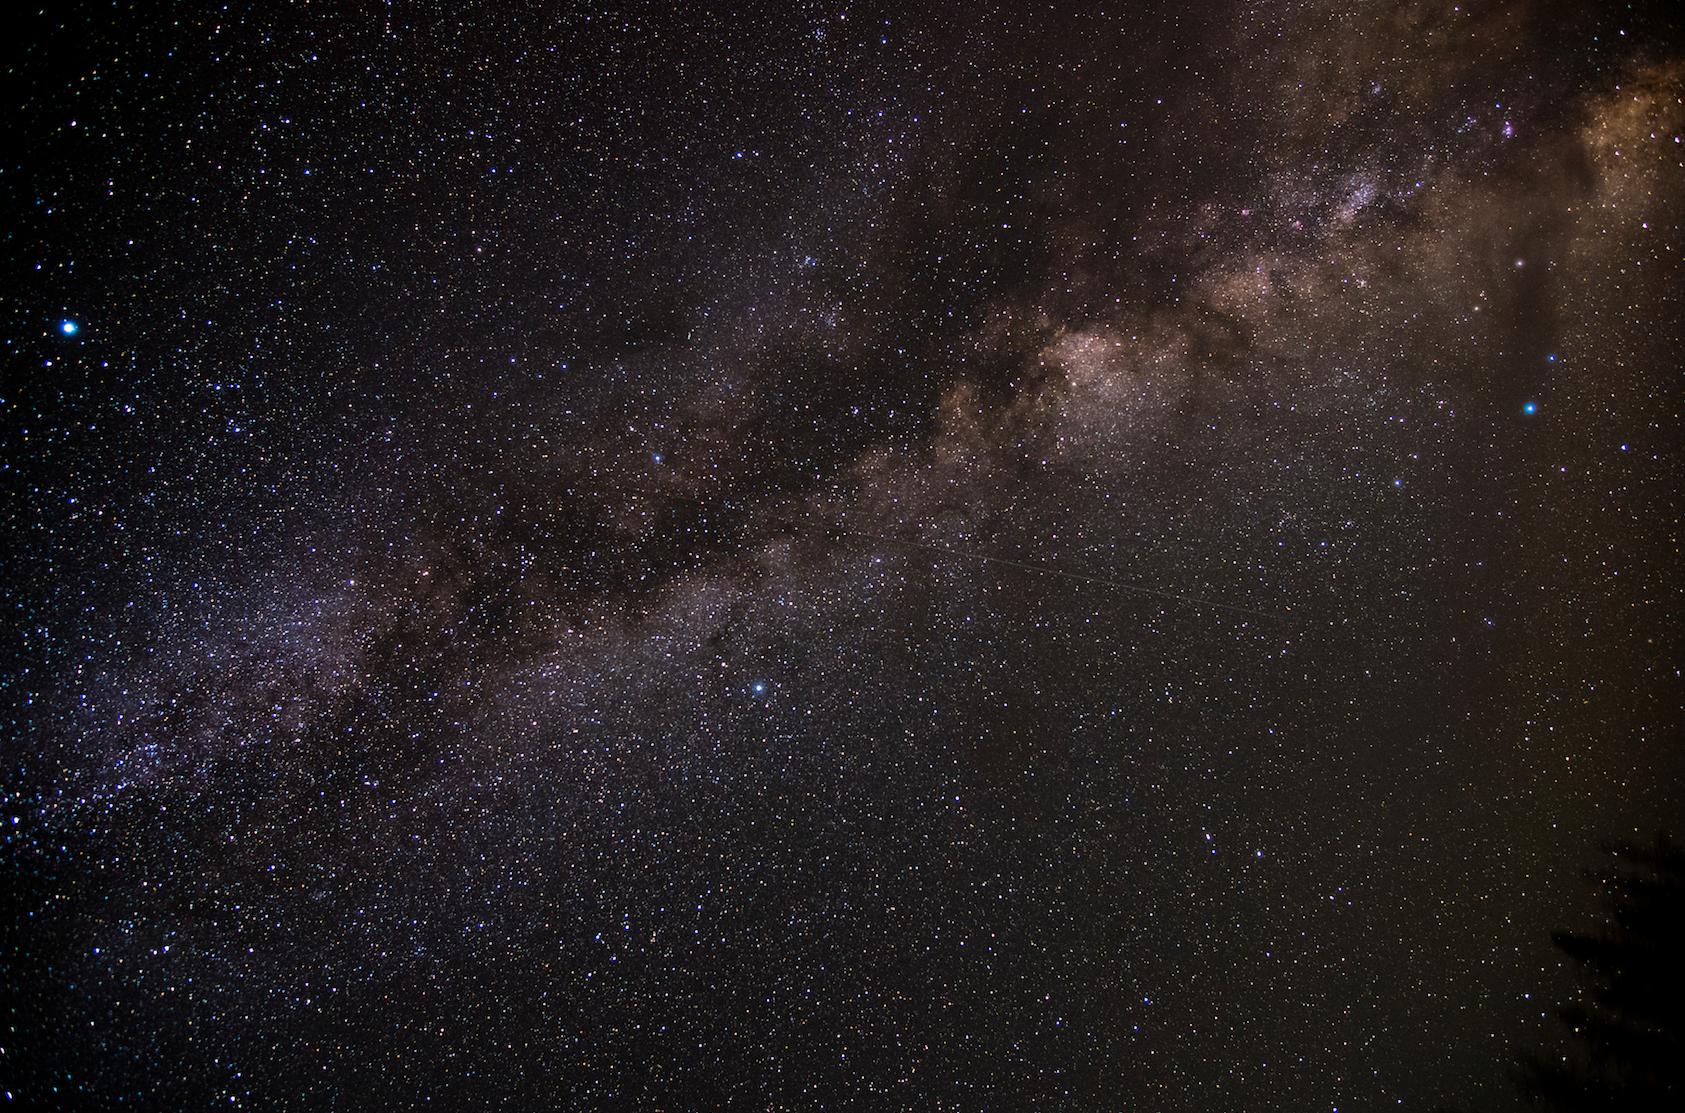 Karen Adair stunning long exposure of insane Milky Way at our 9000 ft camp. A verrrry faint meteor can be seen crossing center.